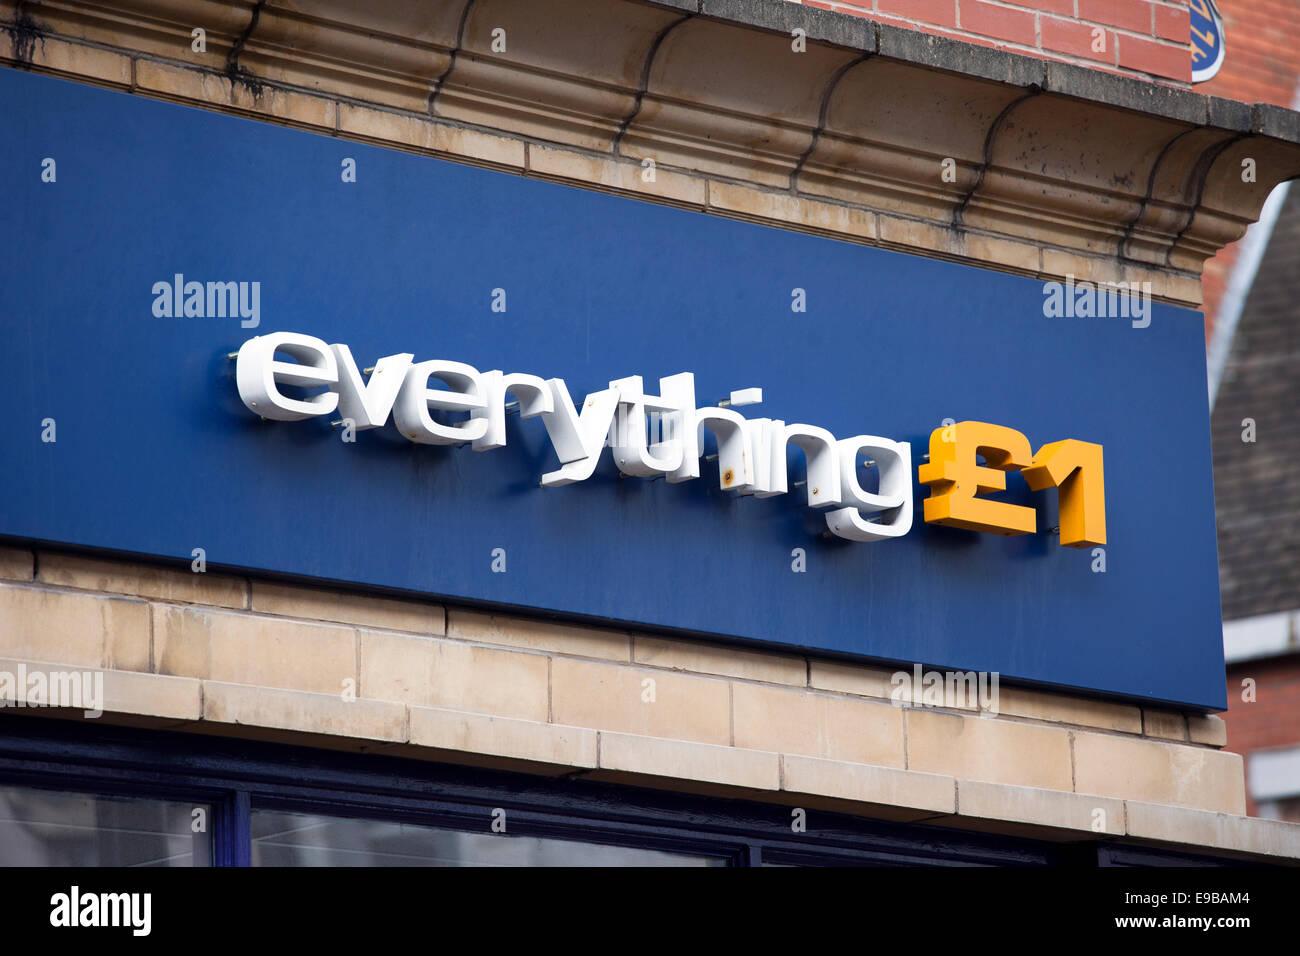 Everything £1 store Warrington Town centre, Cheshire, UK - Stock Image